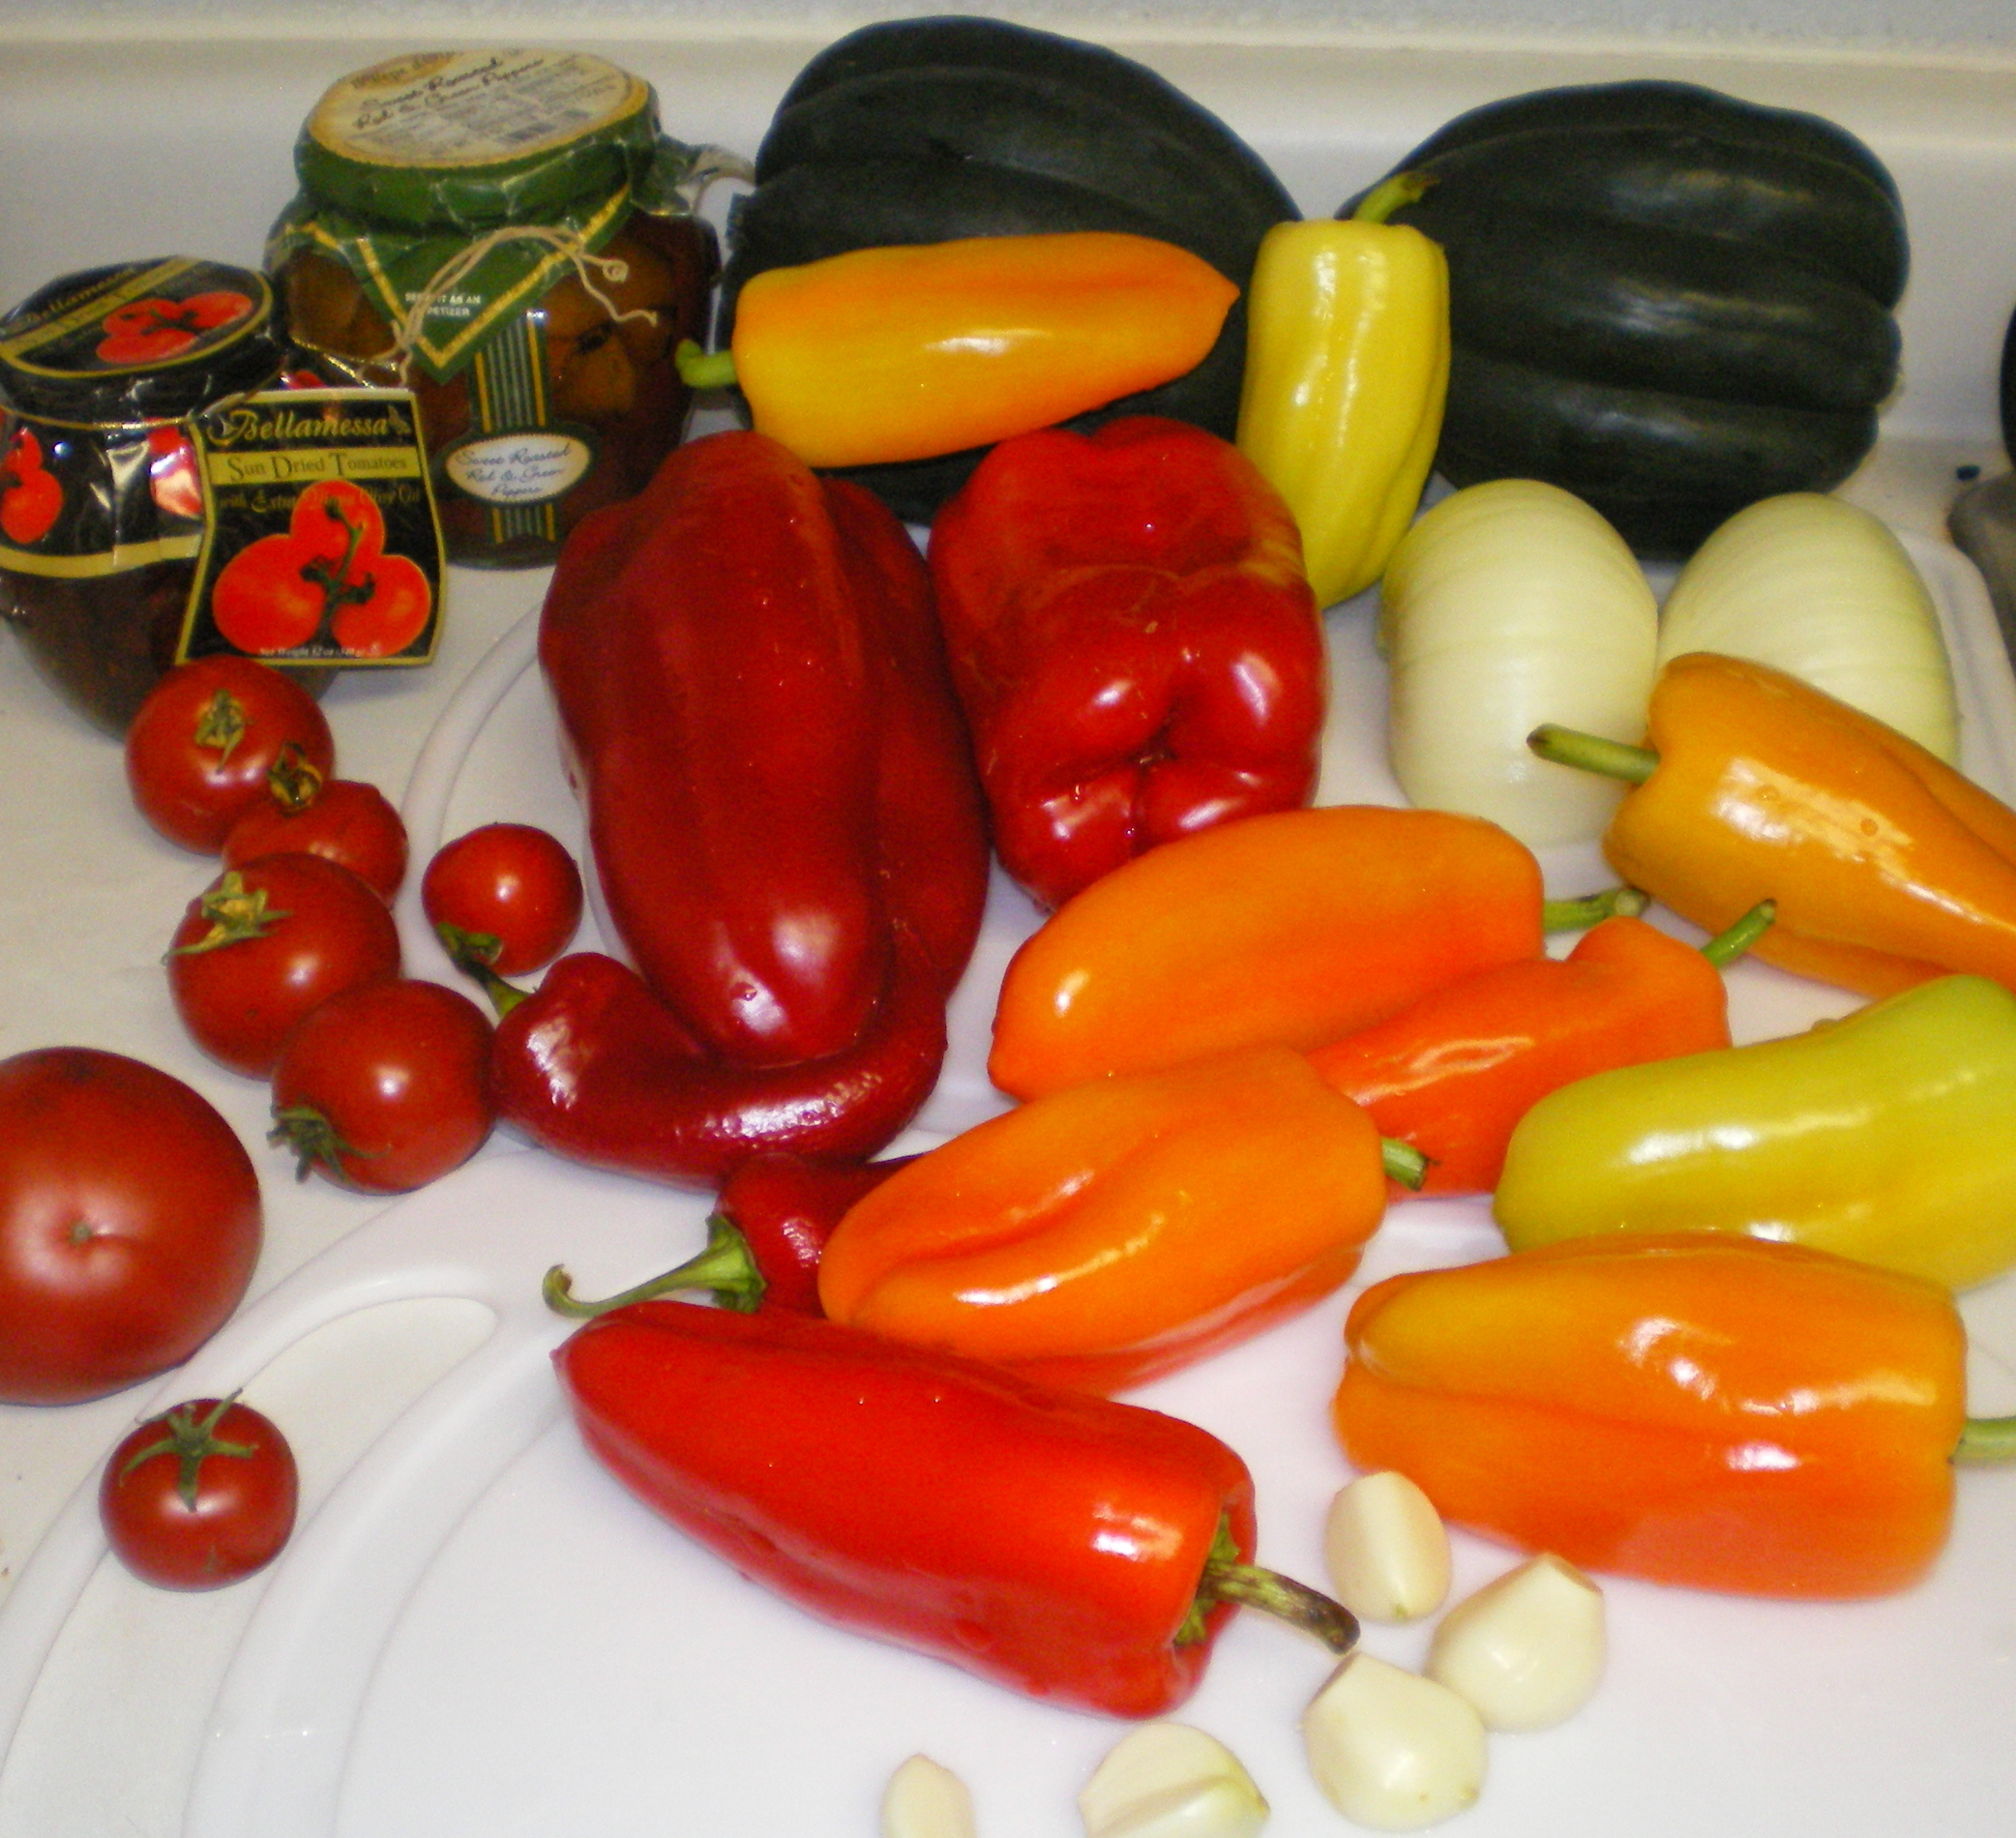 Description Peppers Butternut squash tomato onions garlic dinner.jpg